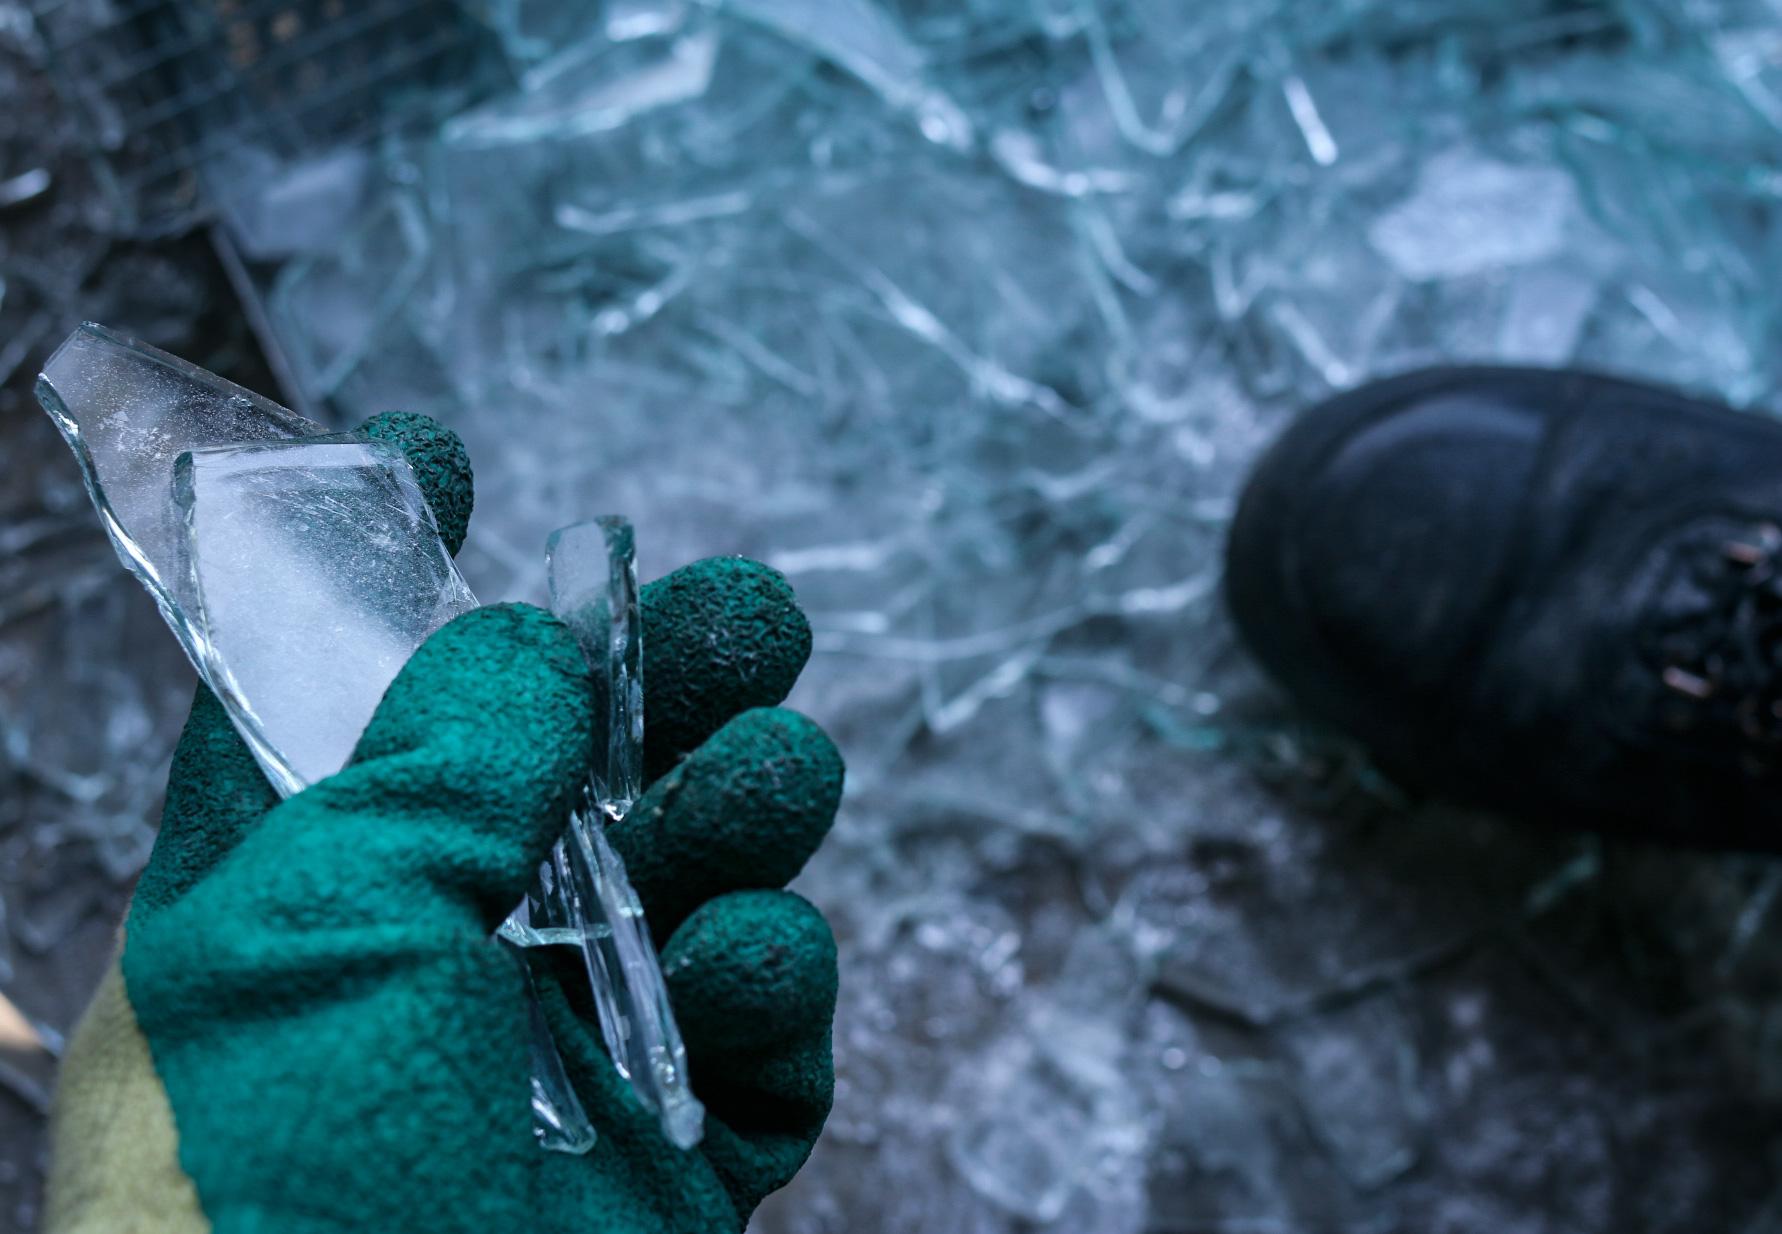 Veilig glas opruimen Glasbreuk Herstel®